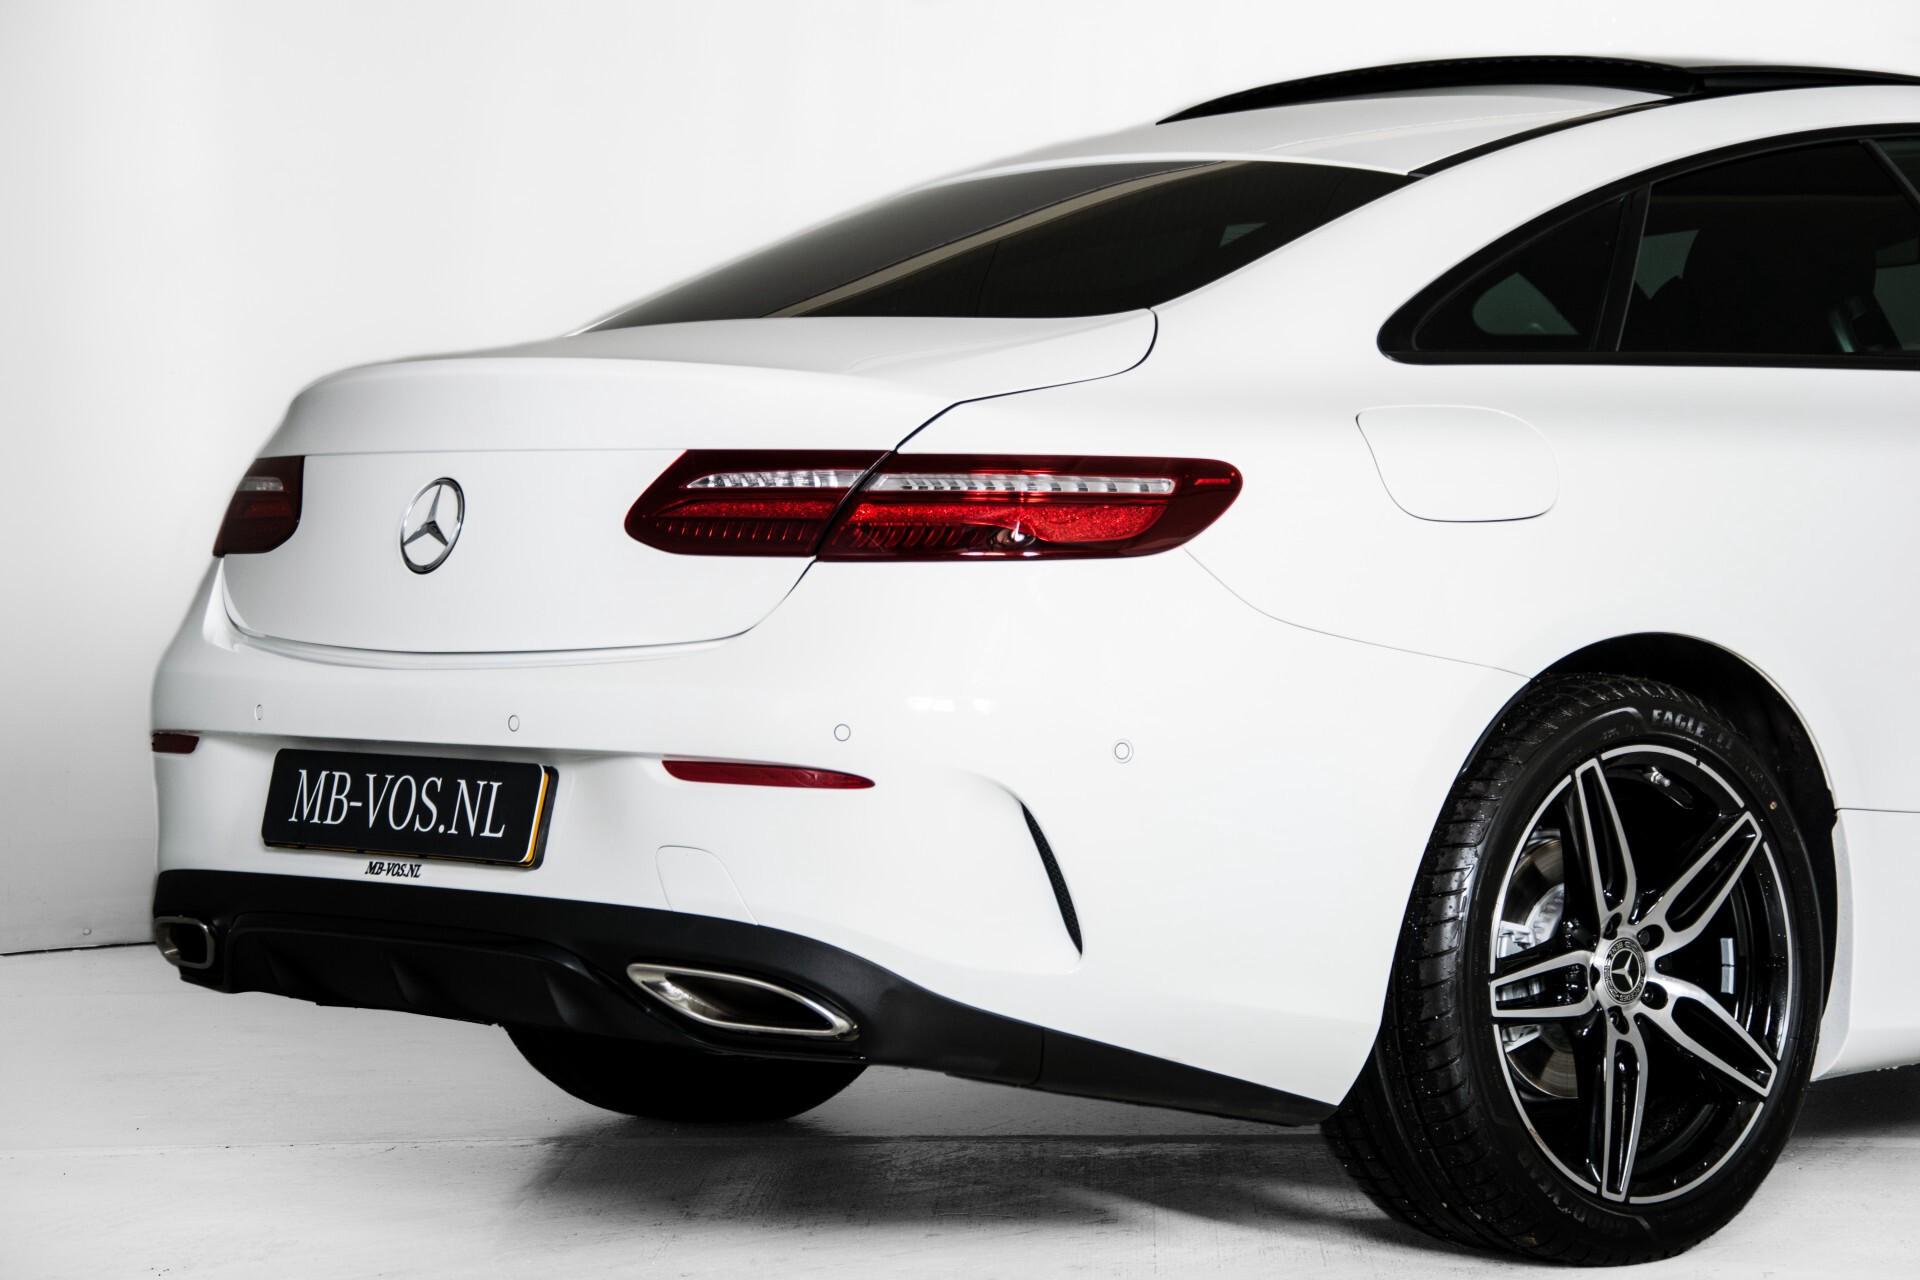 Mercedes-Benz E-Klasse Coupé 300 AMG Panorama/Rij-assist/Keyless/Massage/Memory/HUD/Standkachel/Night Aut9 Foto 59